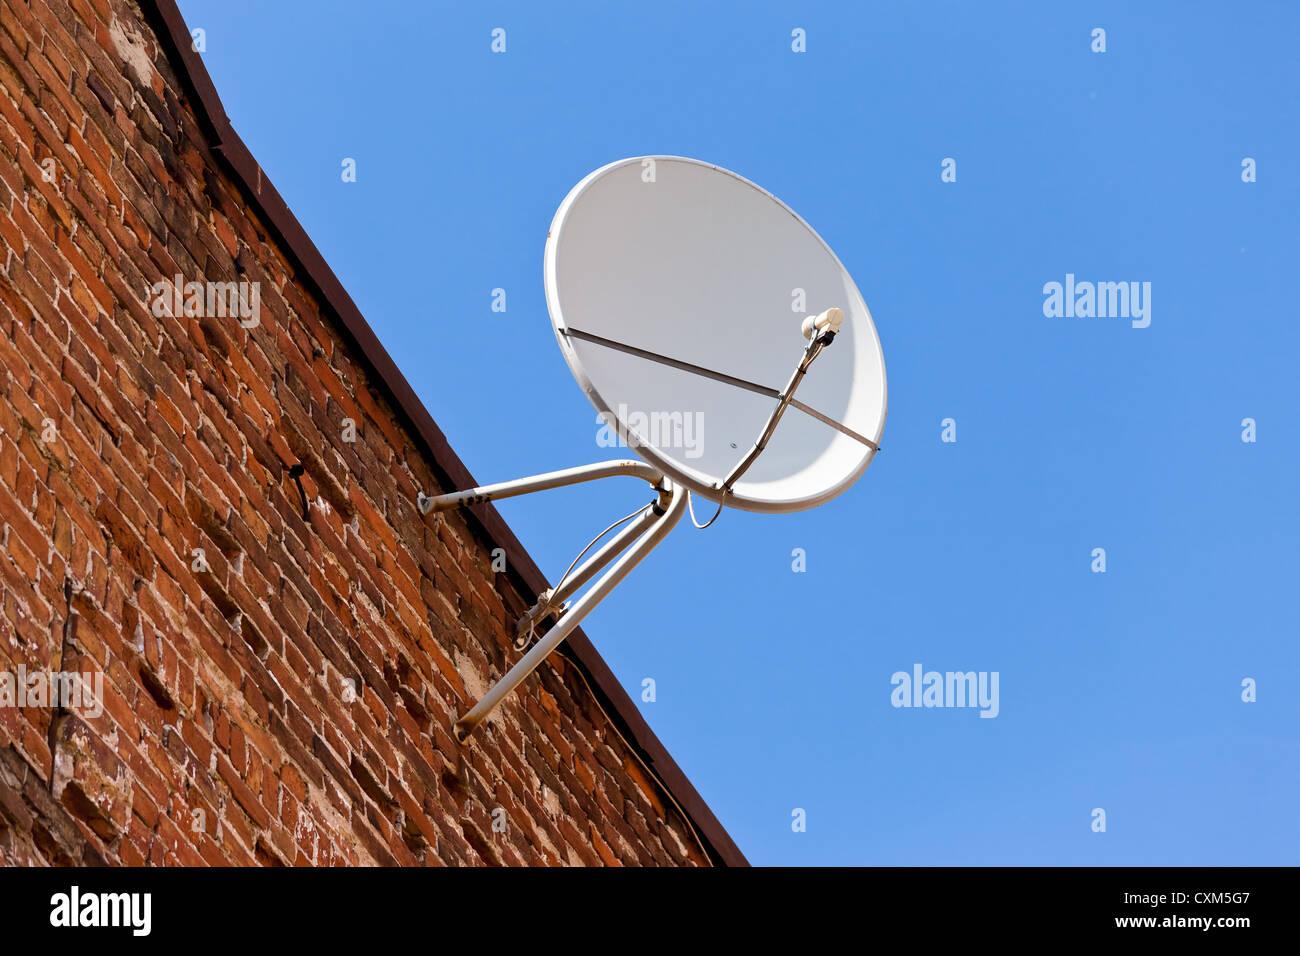 Satellite Dish mounted on old brick wall. Stock Photo